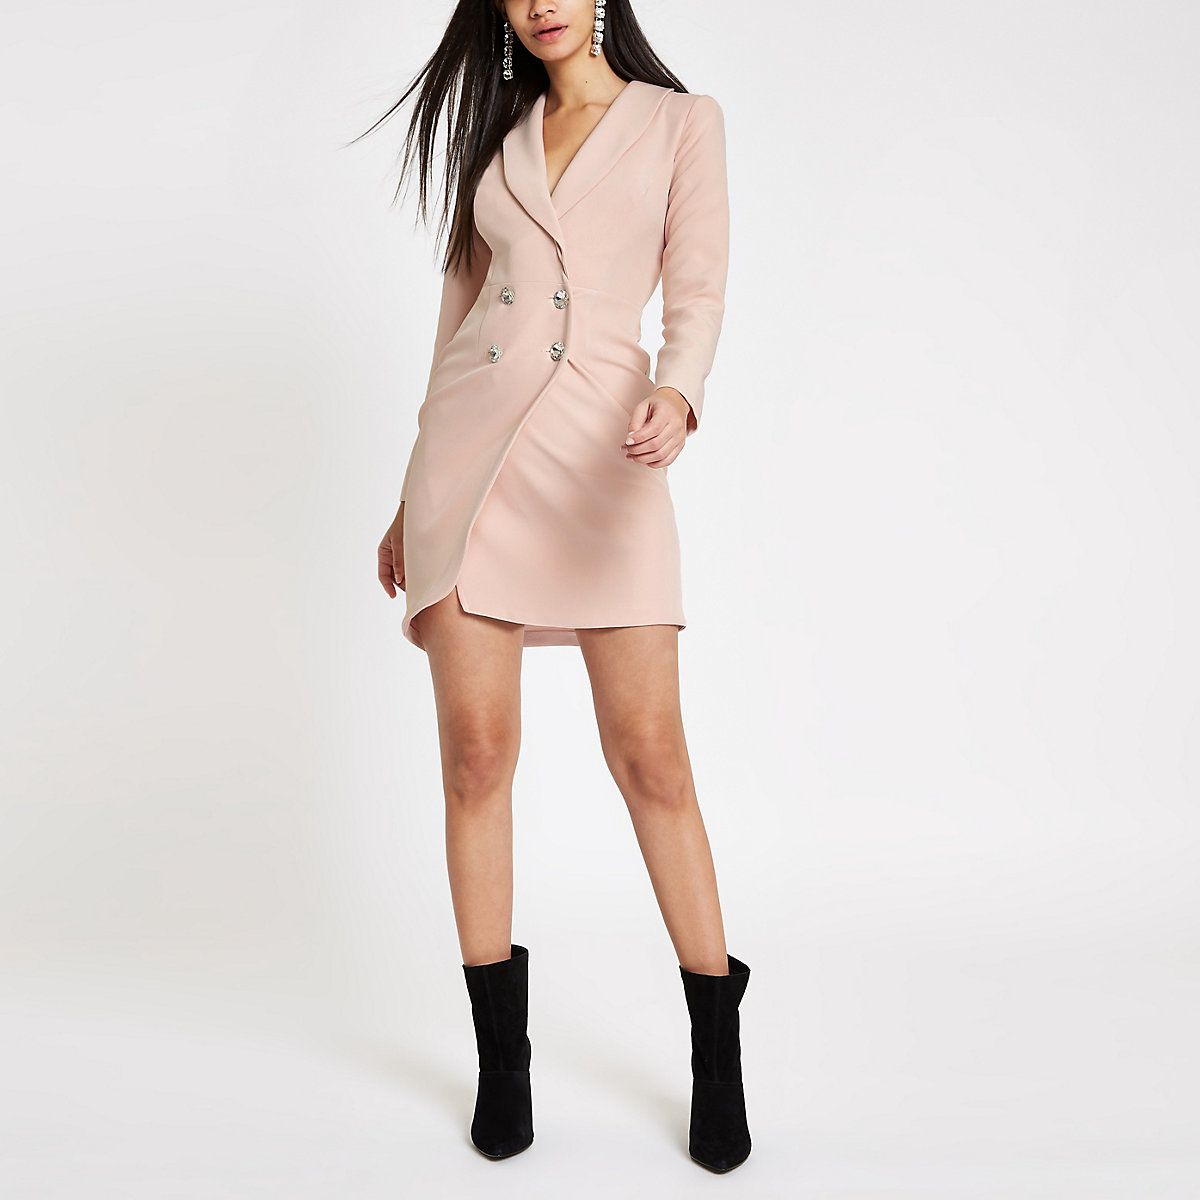 Light pink rhinestone bodycon tux dress